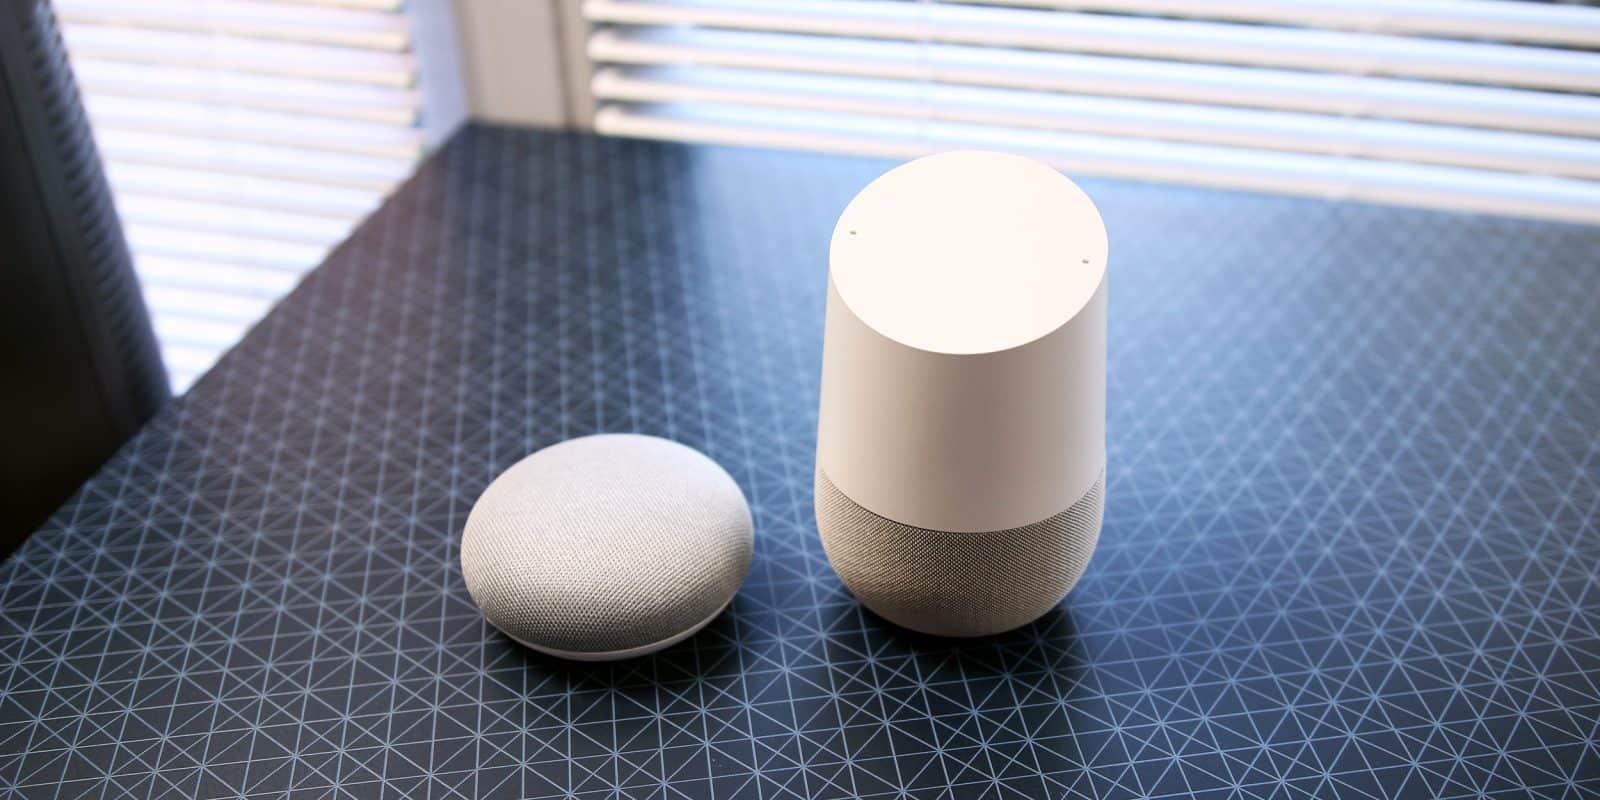 TechGyo_Google Home